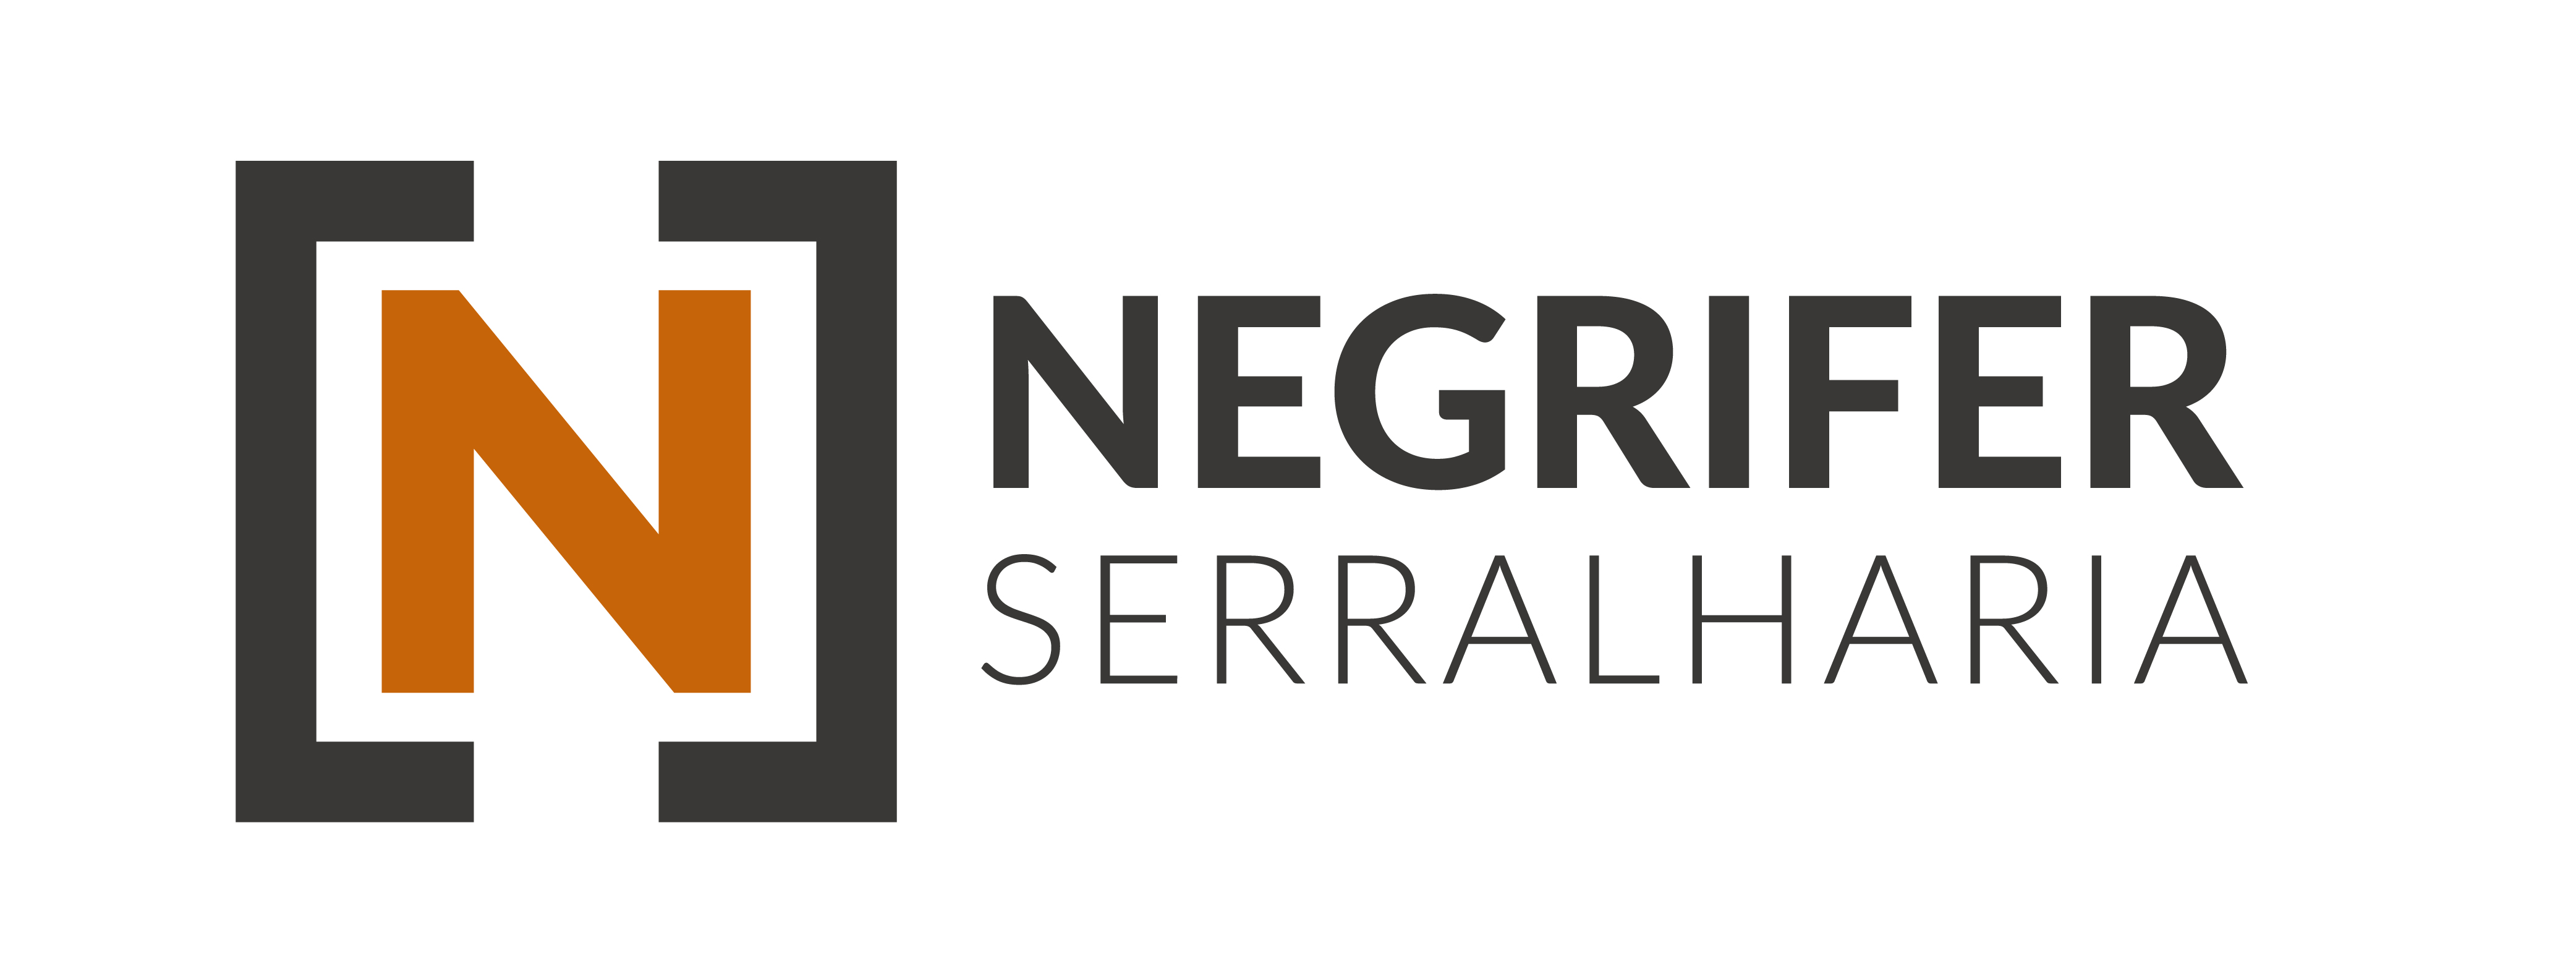 Negrifer Serralharia